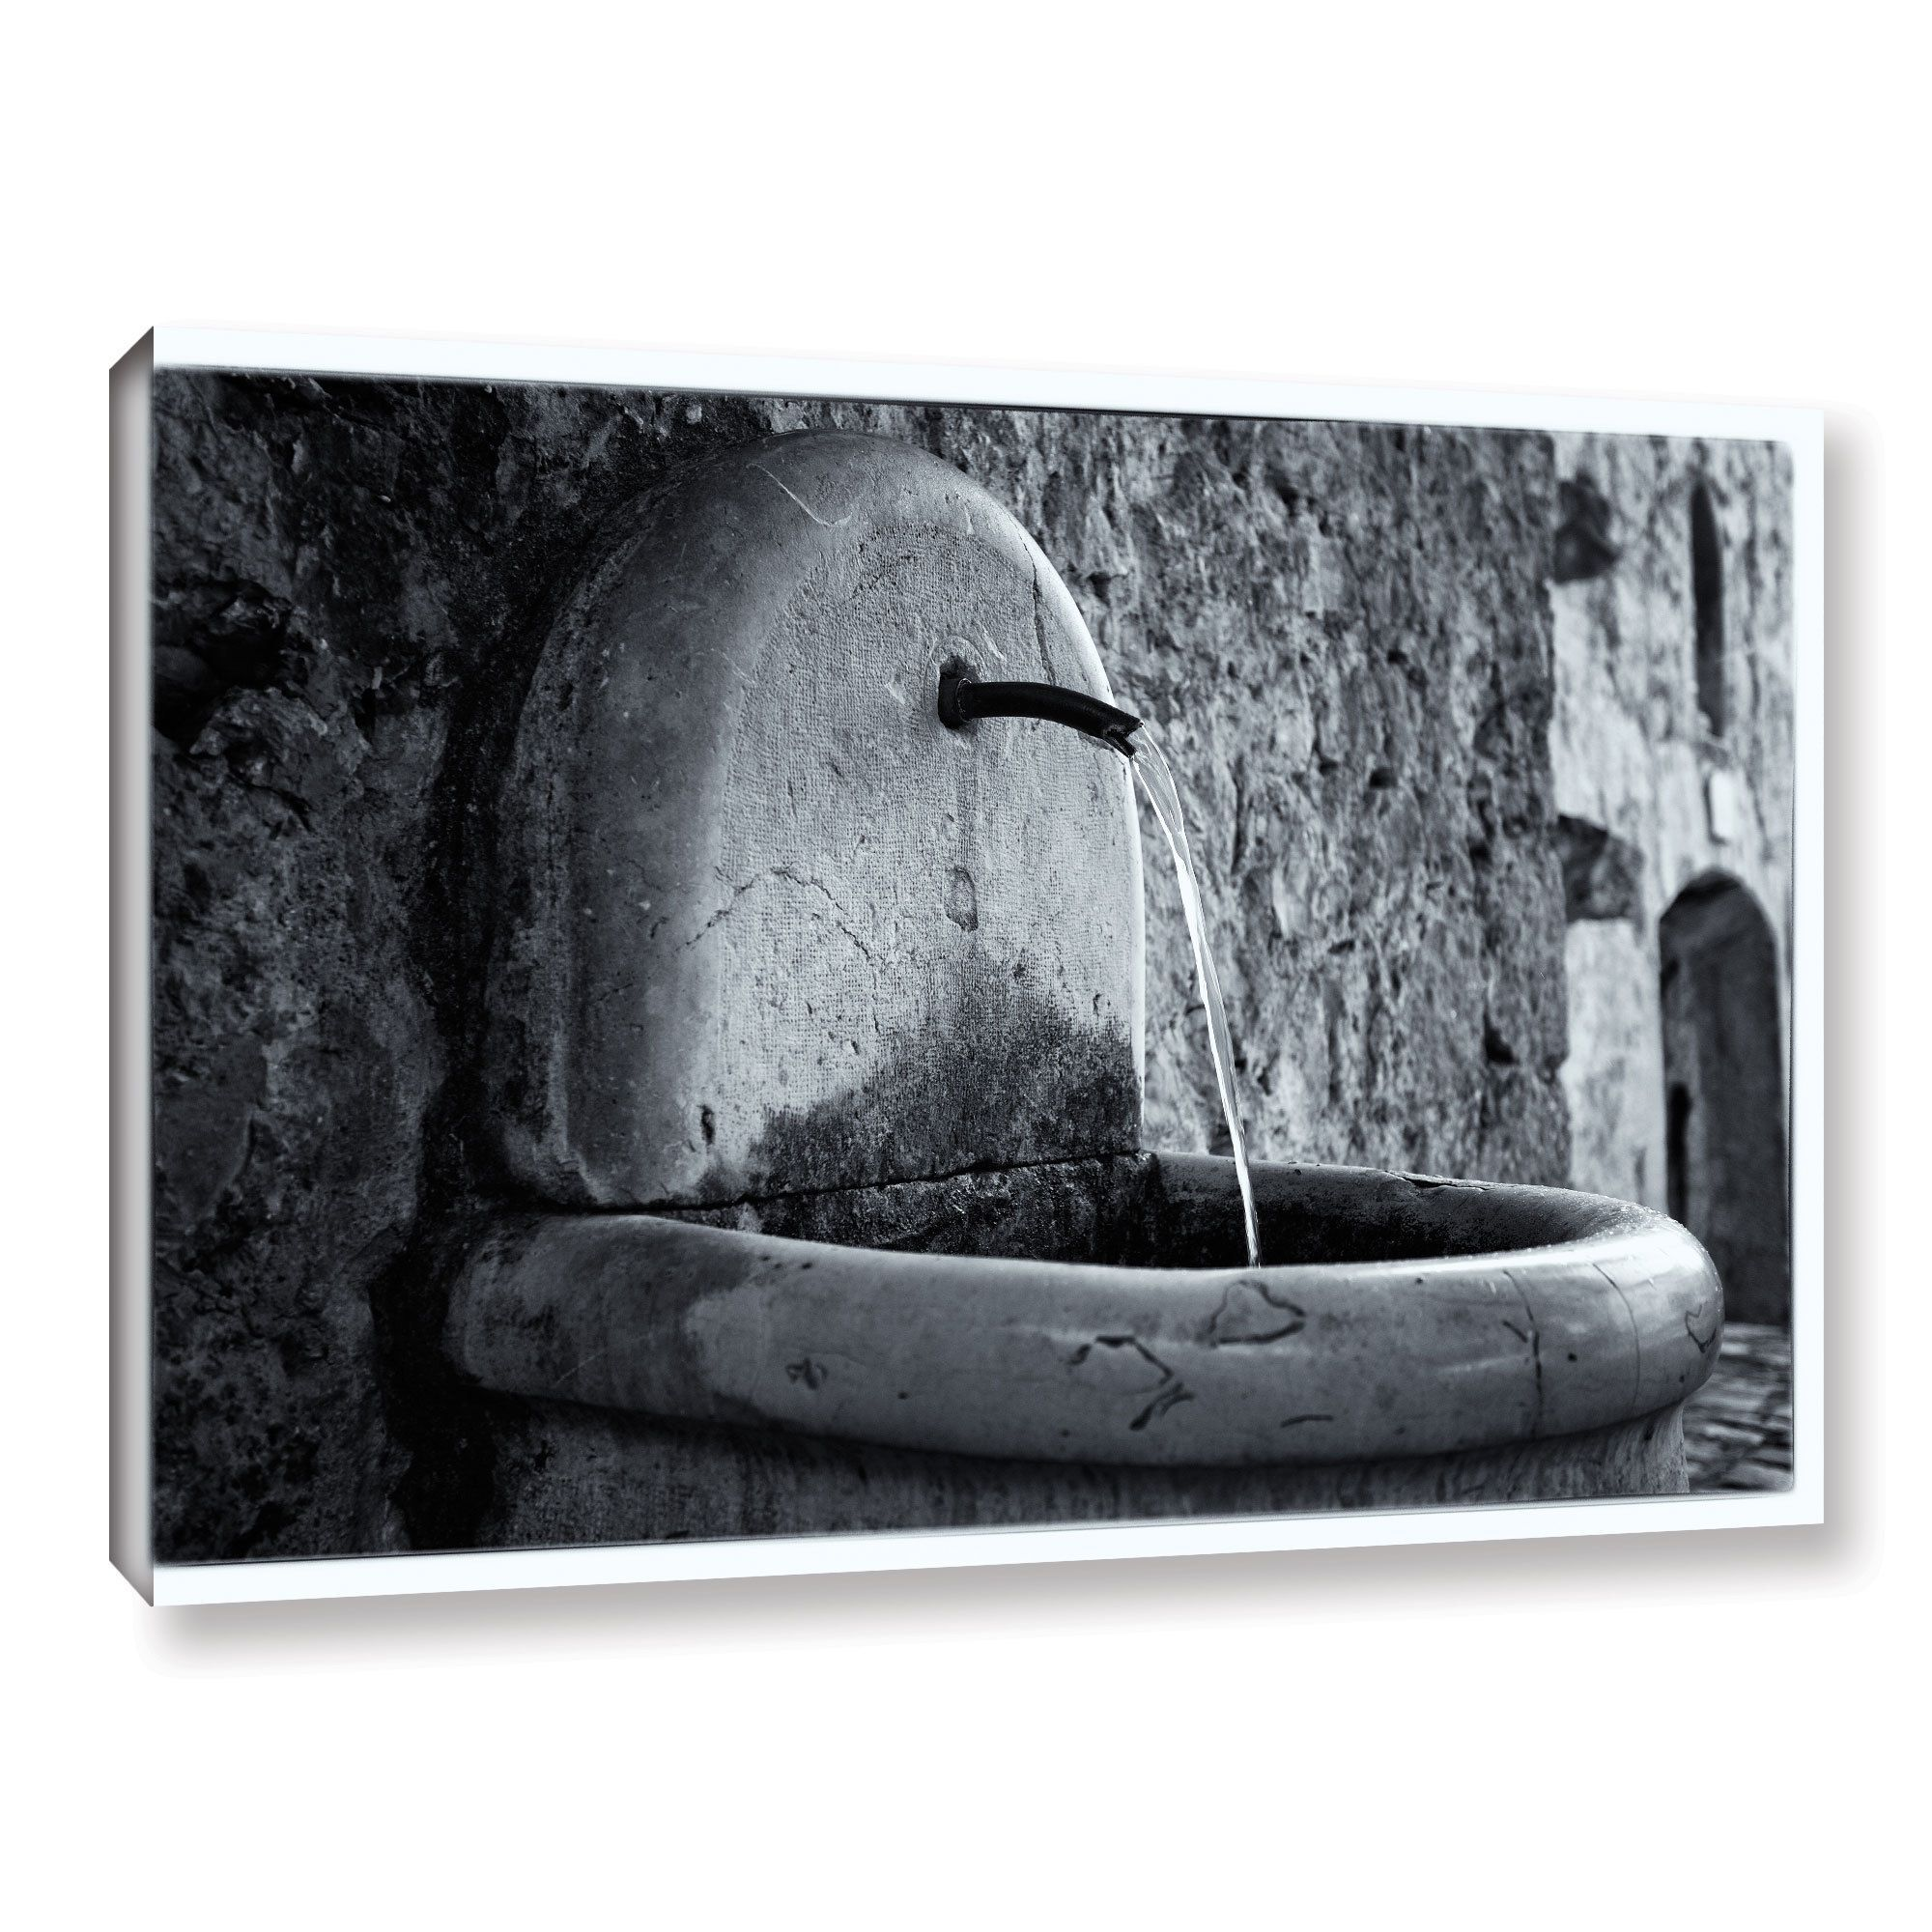 ArtWall Simon Kayne 'St. Paul De Vence Fountain' Gallery Wrapped